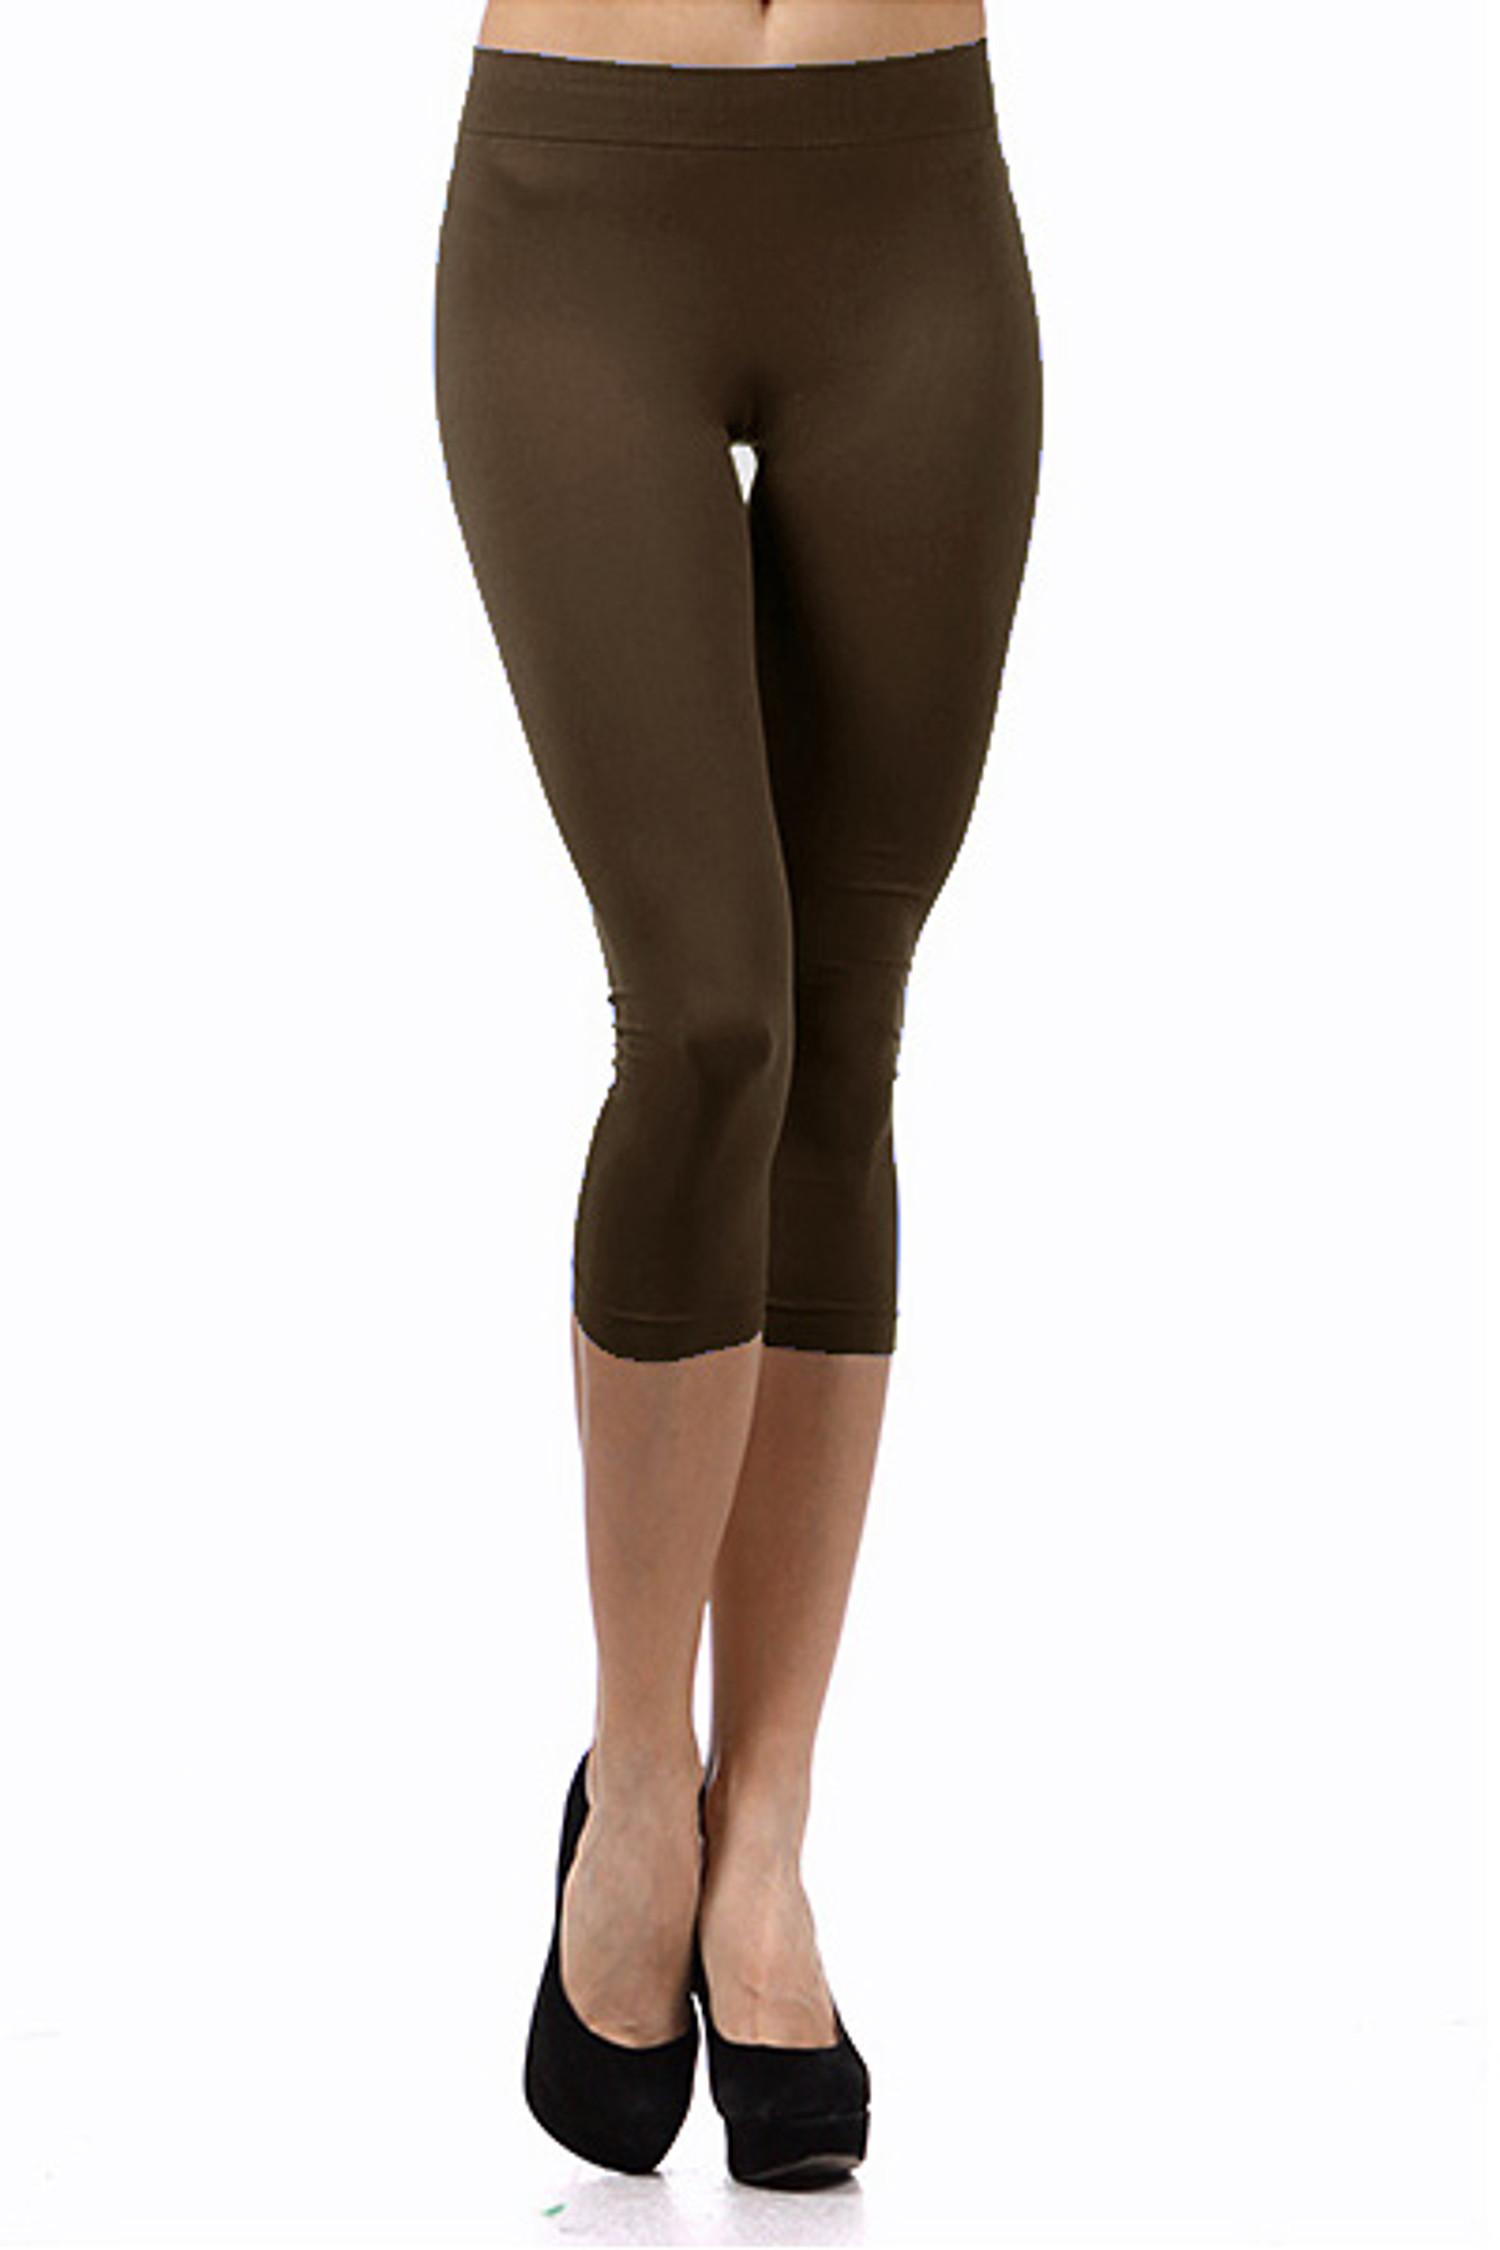 Basic Capri Length Spandex Leggings Brown